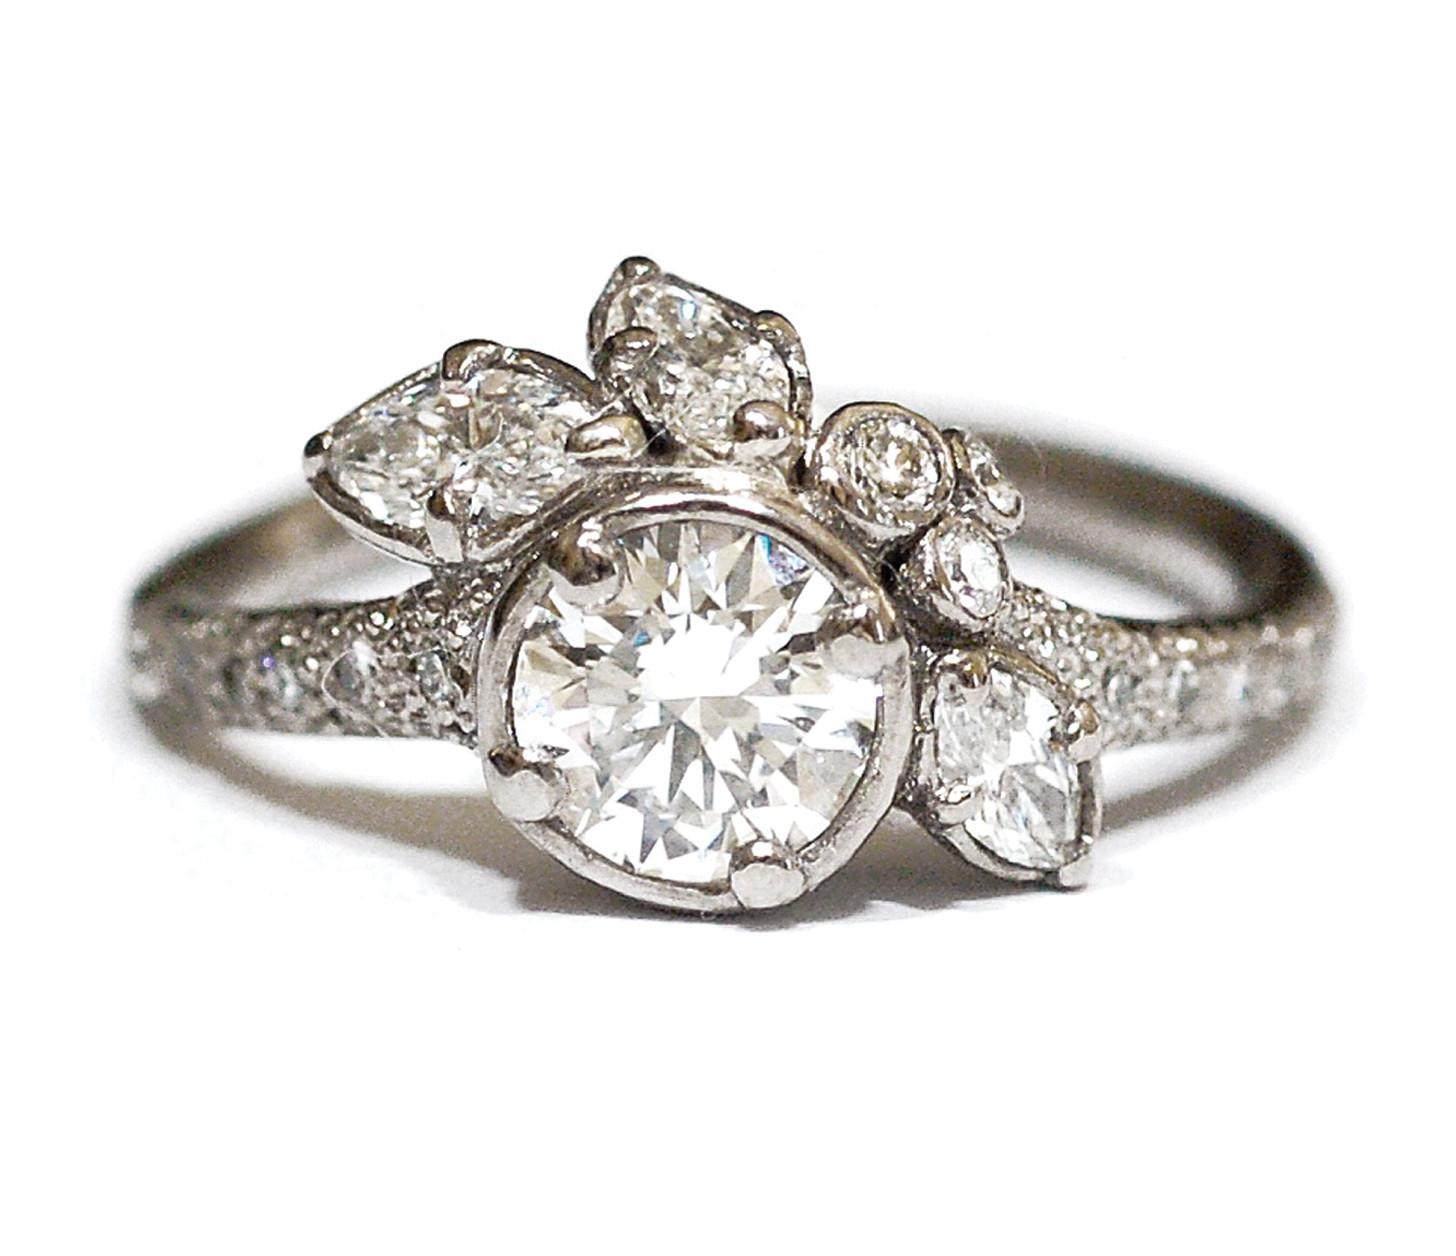 Diamond 'Giardinetti' Ring